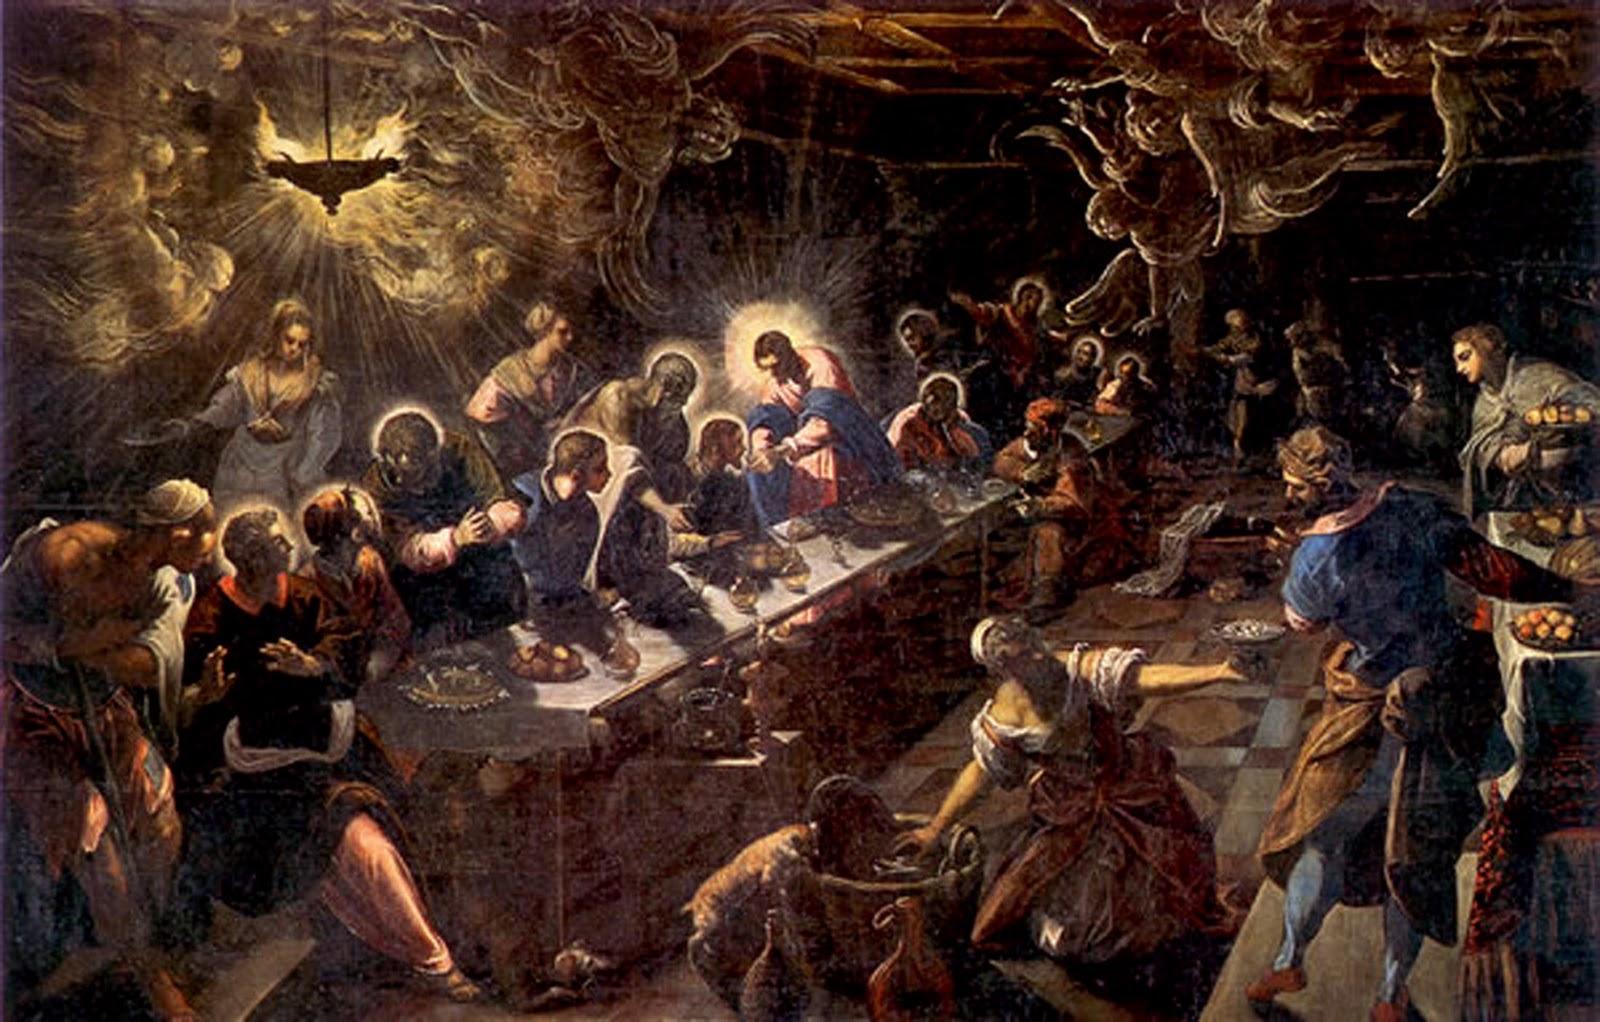 Figura 18. Jacopo Tintoretto, Última ceia